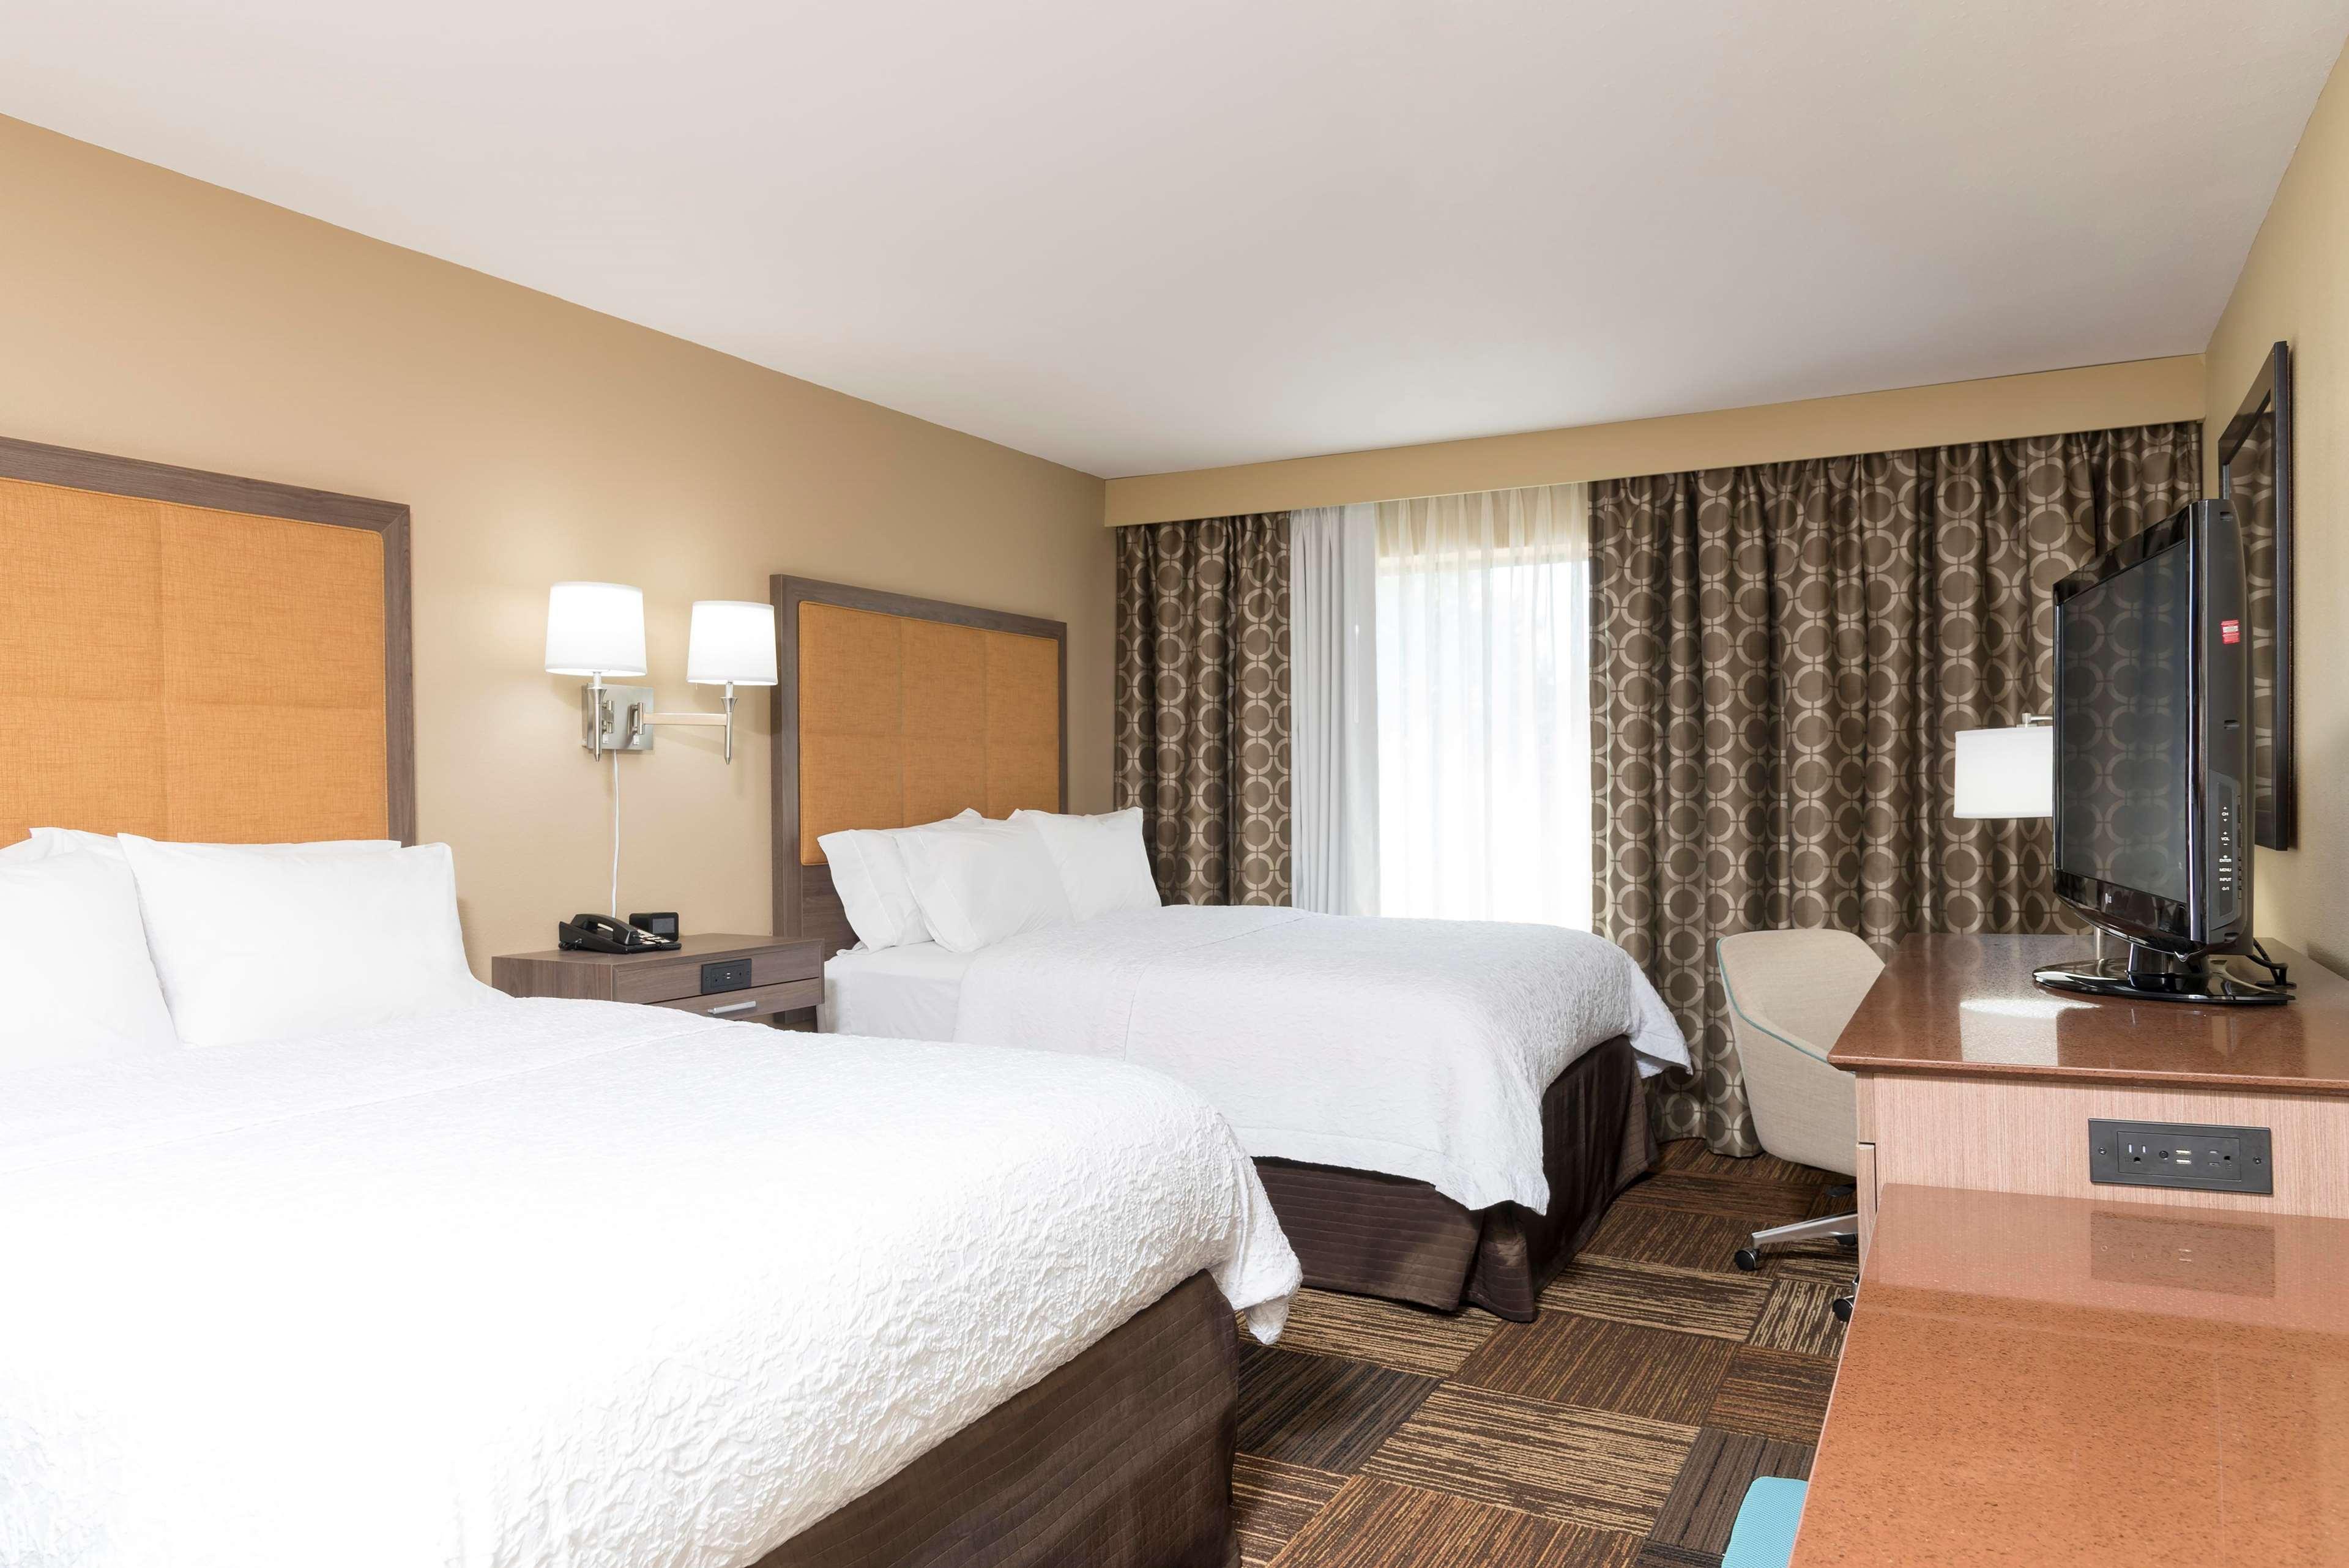 Hampton Inn & Suites Mansfield-South @ I-71 image 30